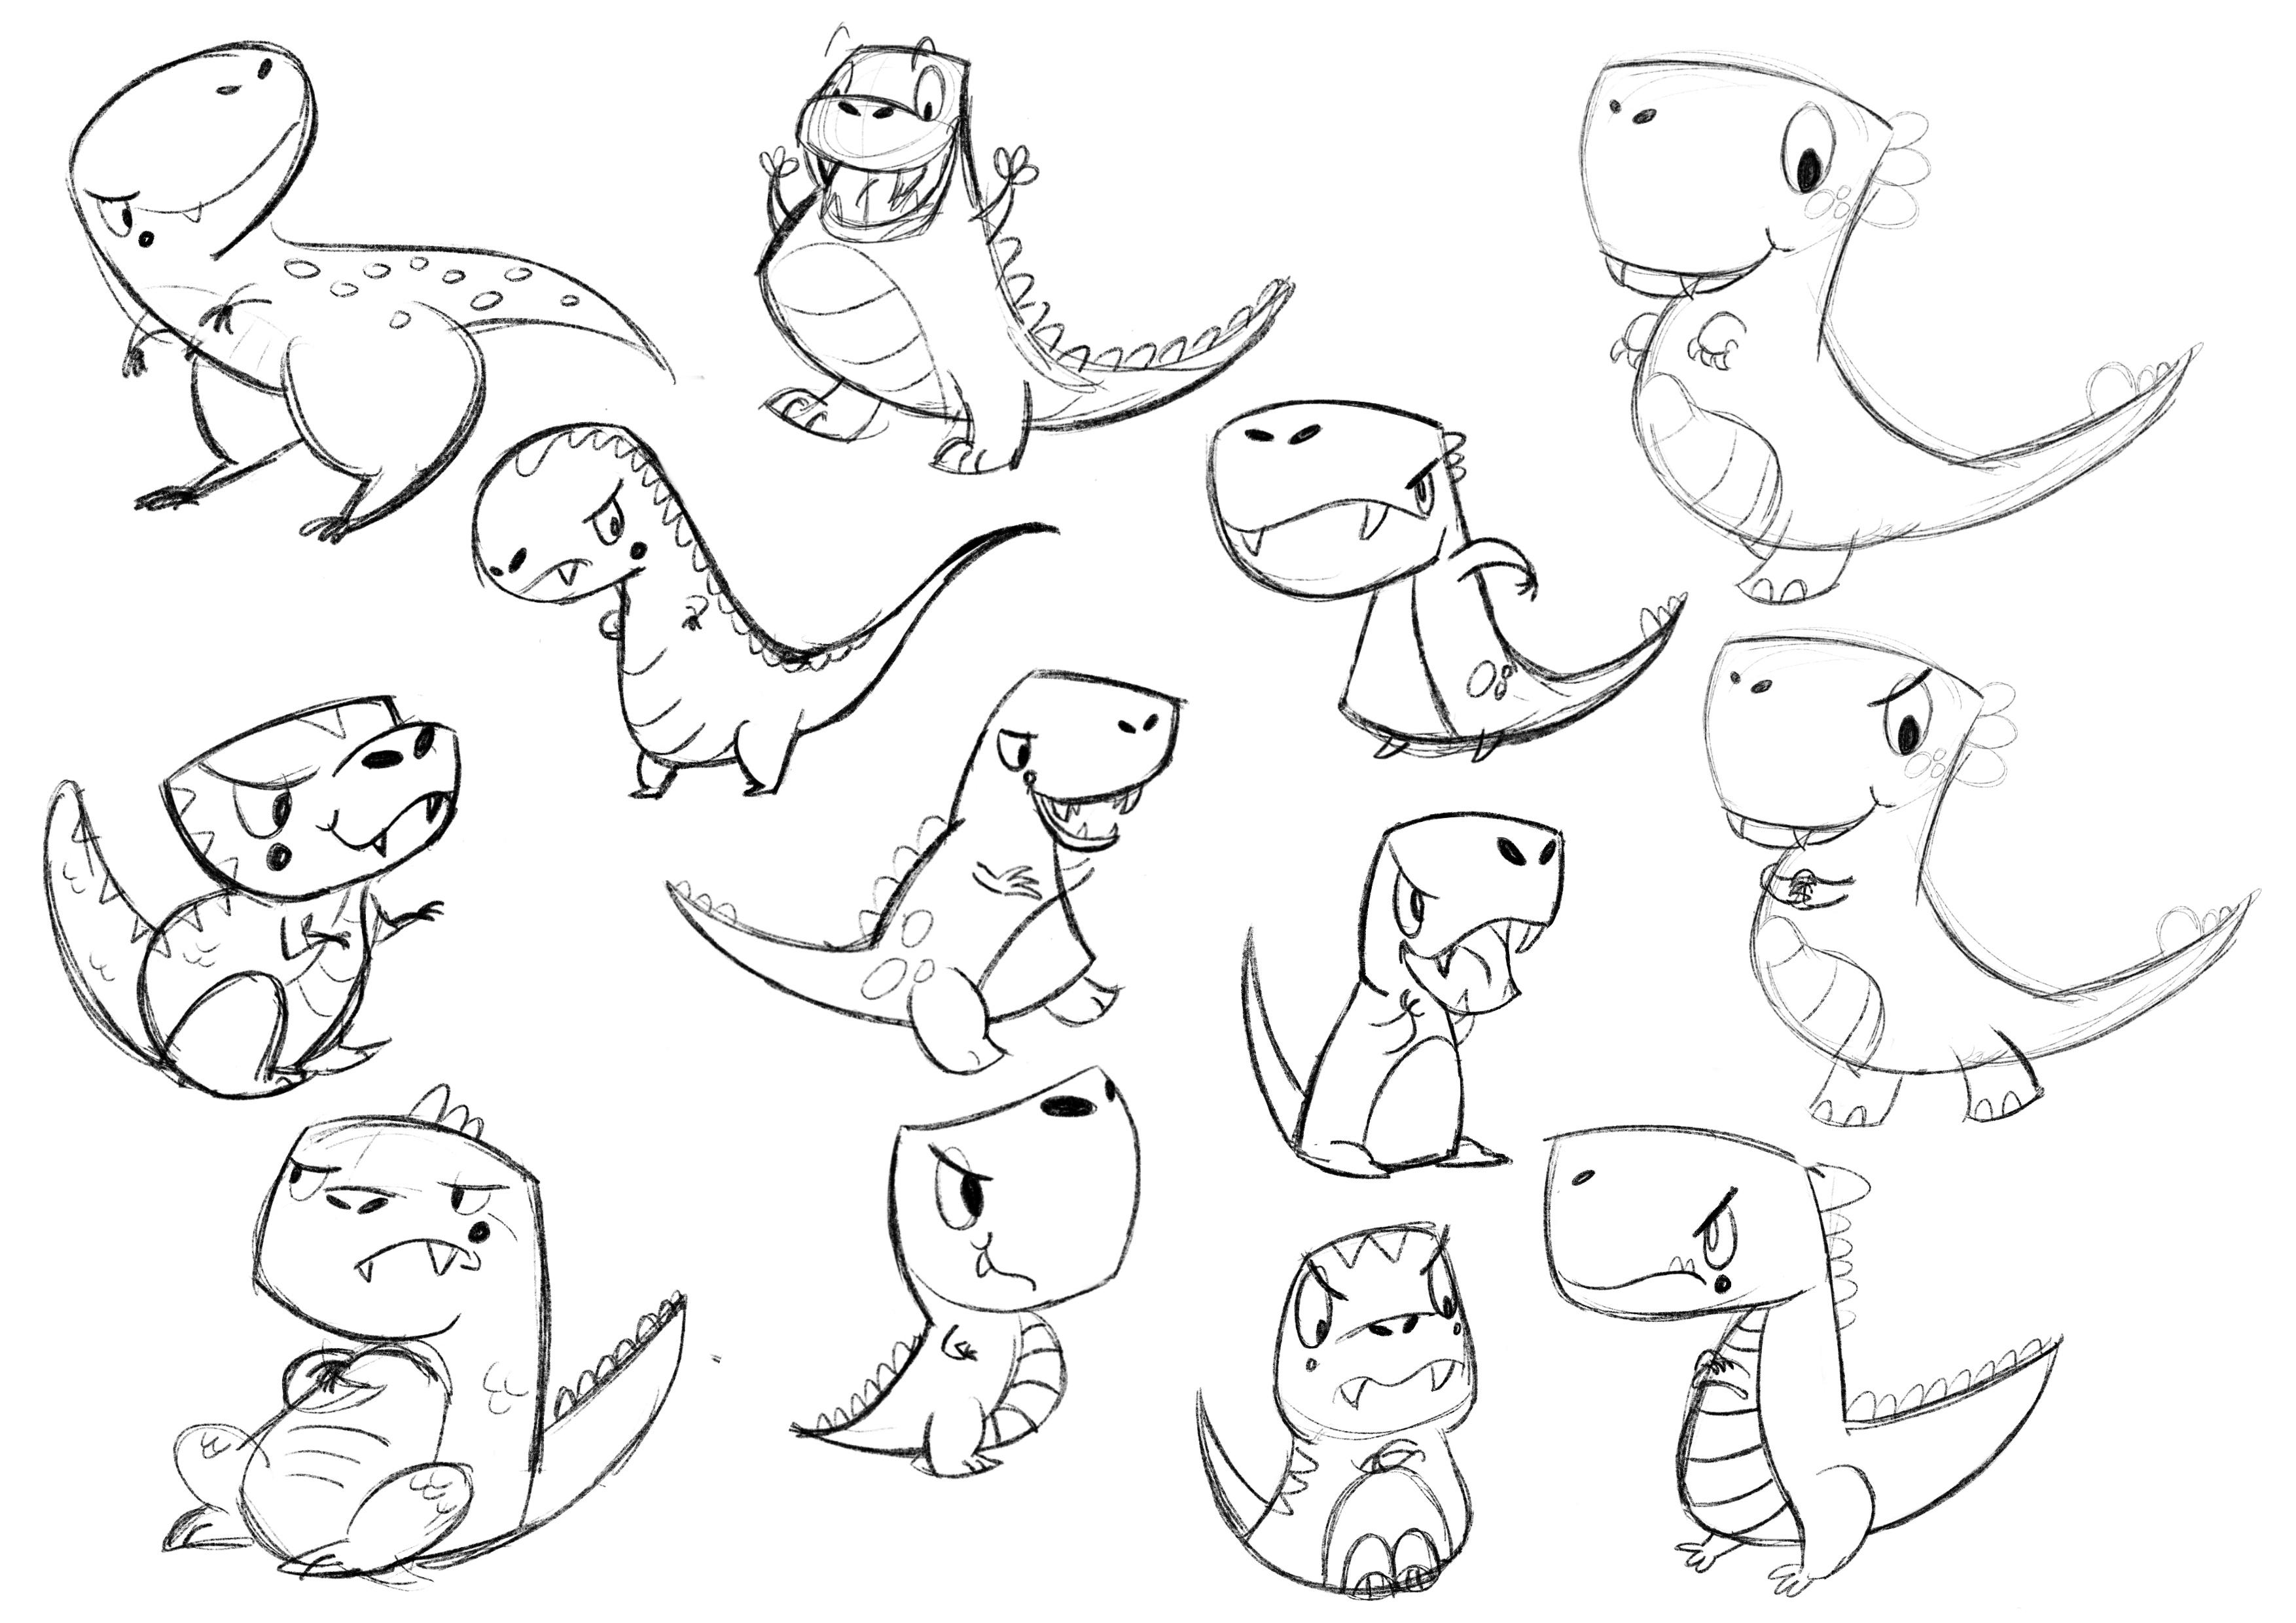 Grumpy character designs